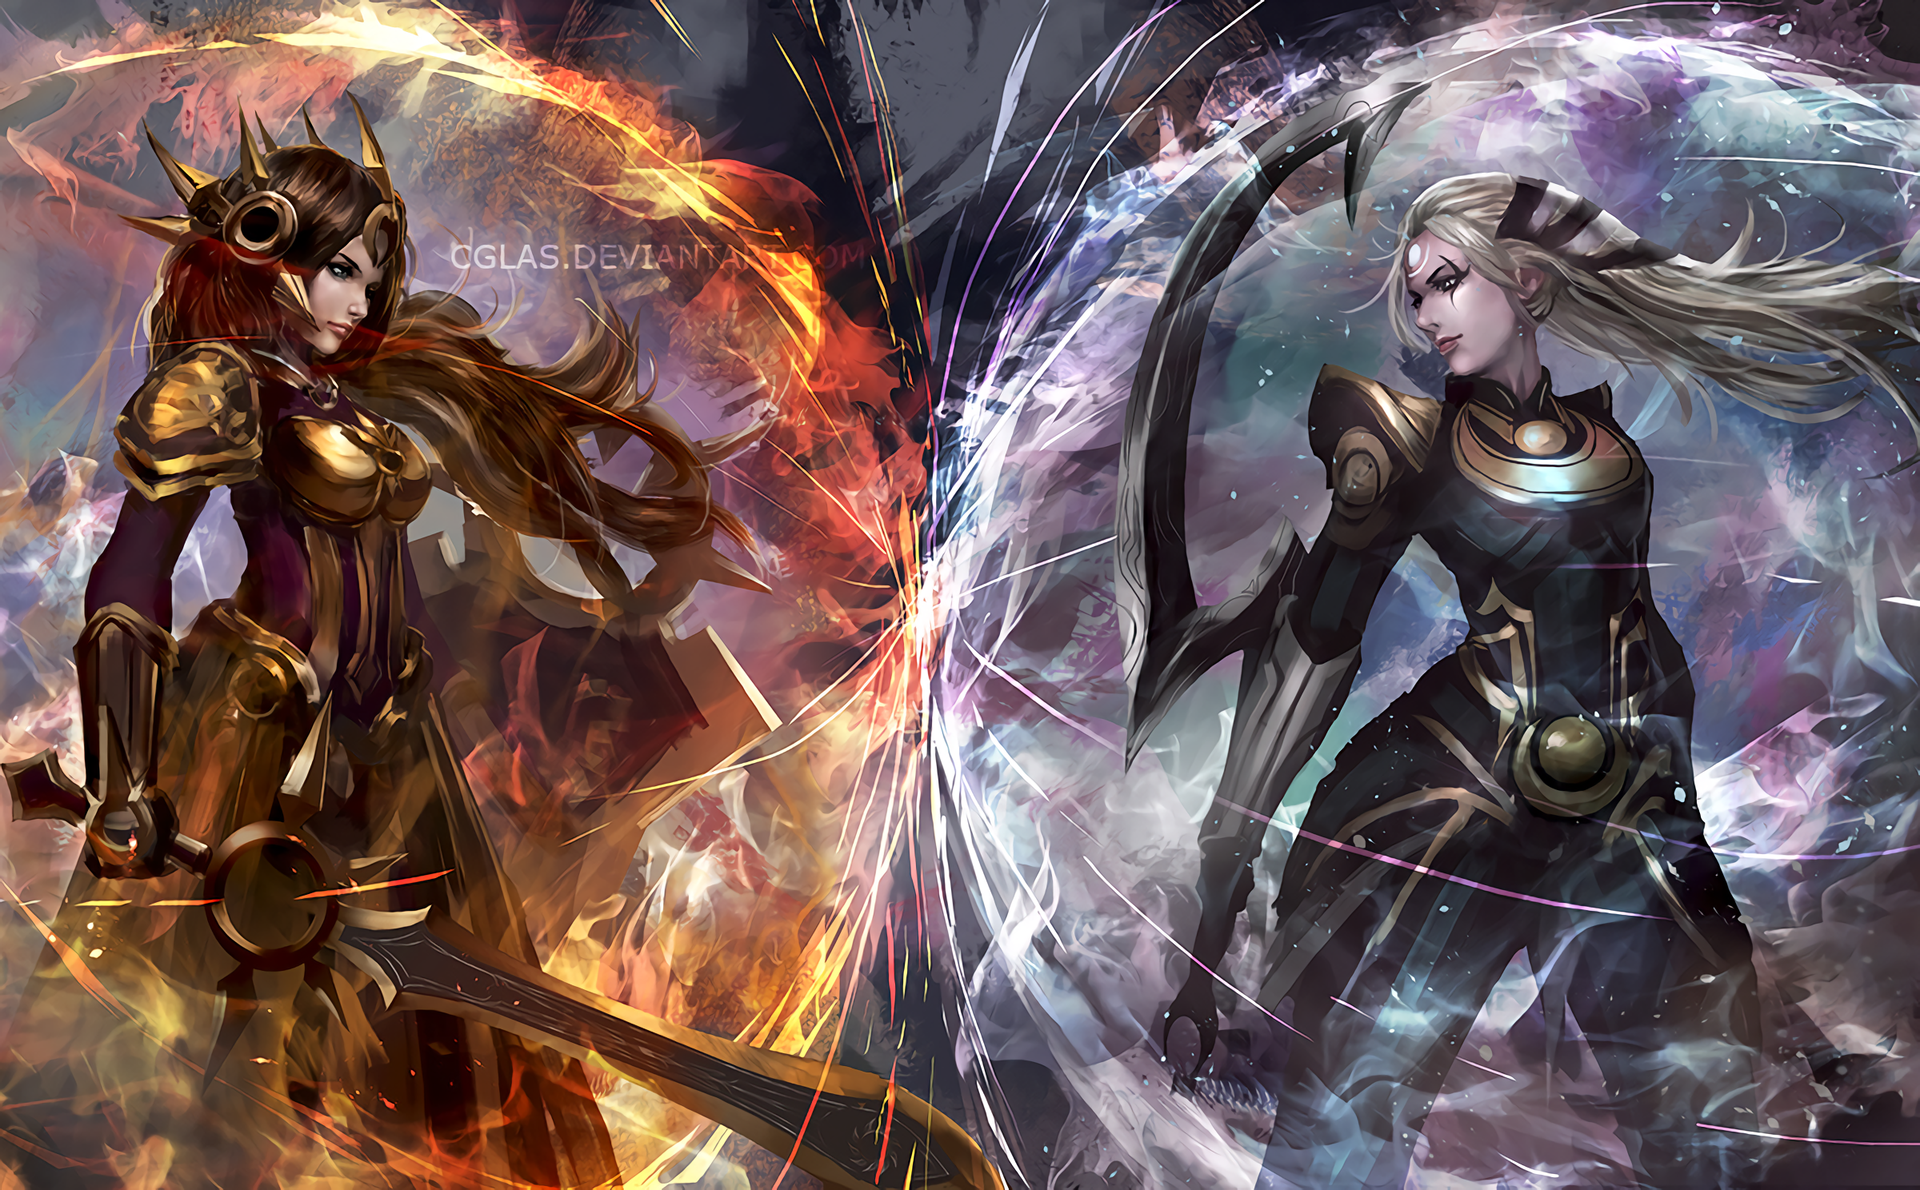 Video Game League Of Legends Leona Diana Wallpaper ภาพวาด สาวอ